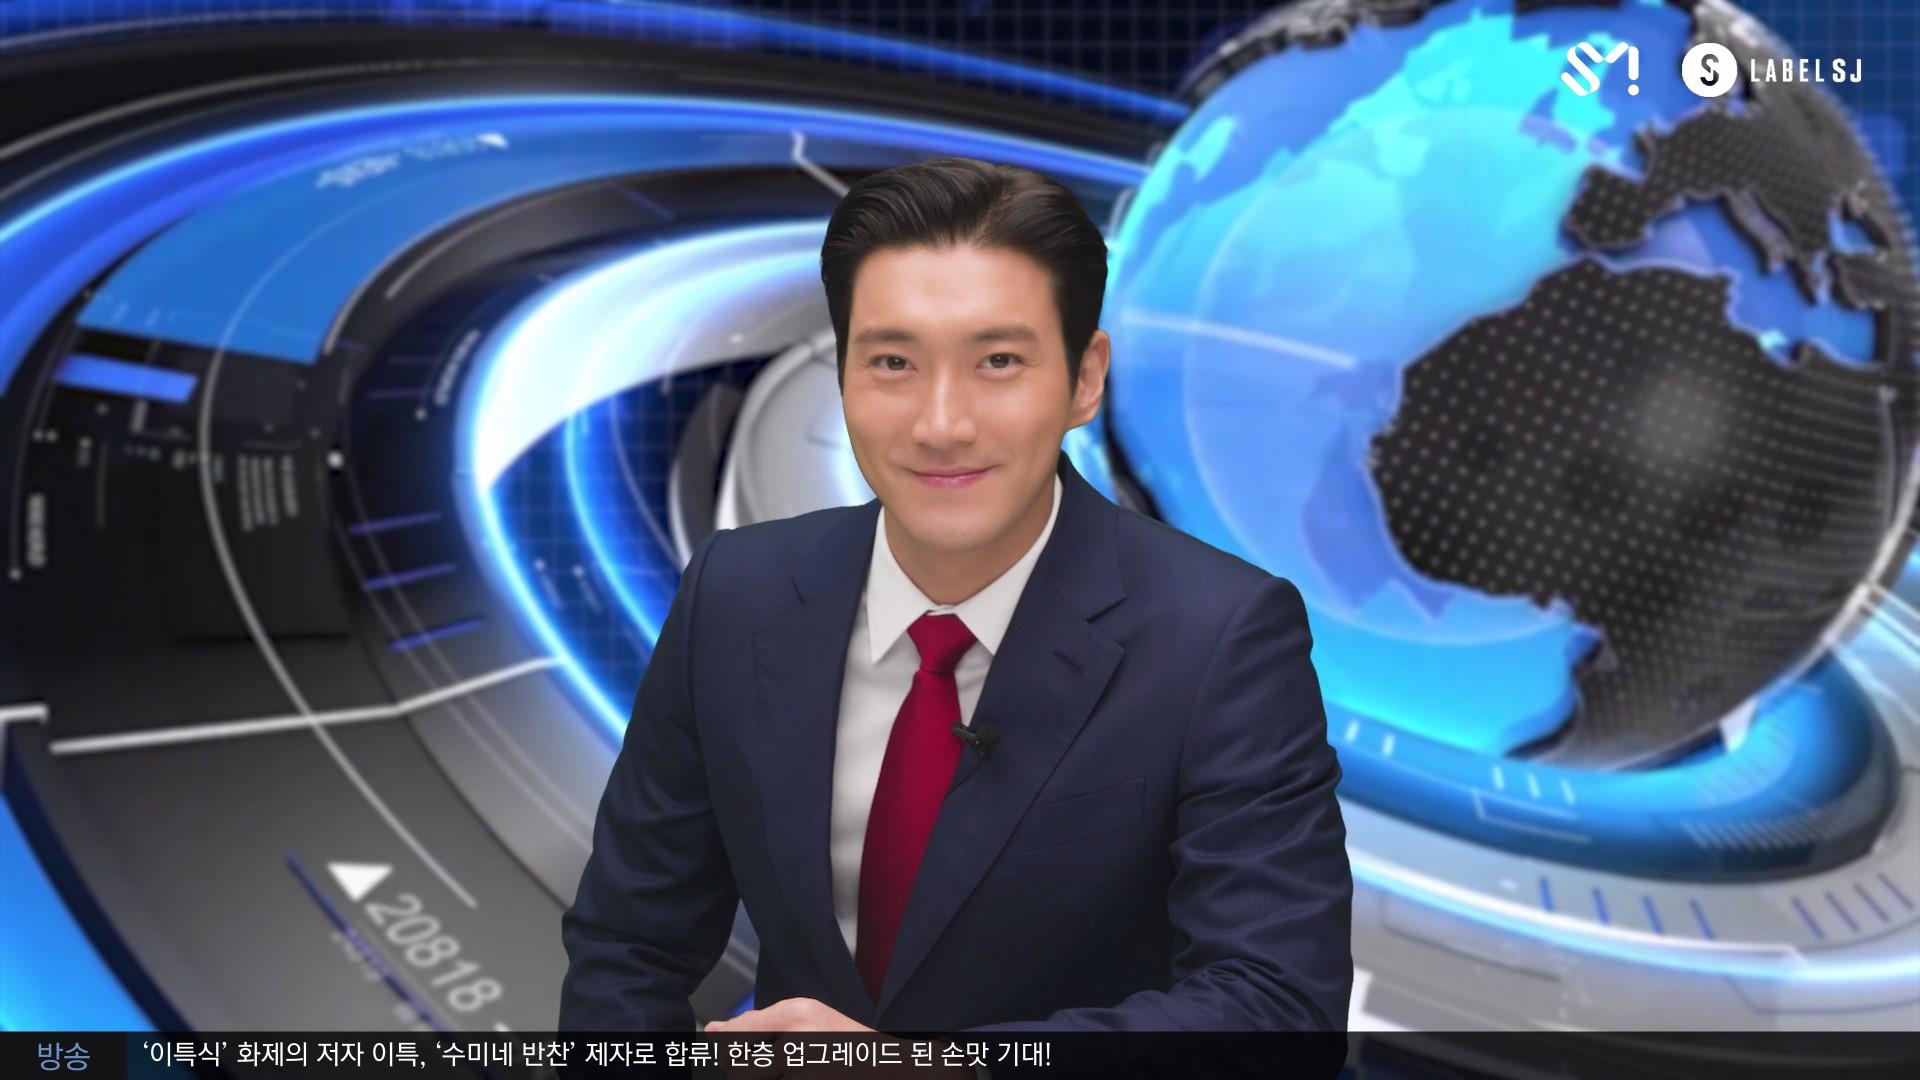 [SJ NEWS Ep.3] 슈주 뉴스 3회